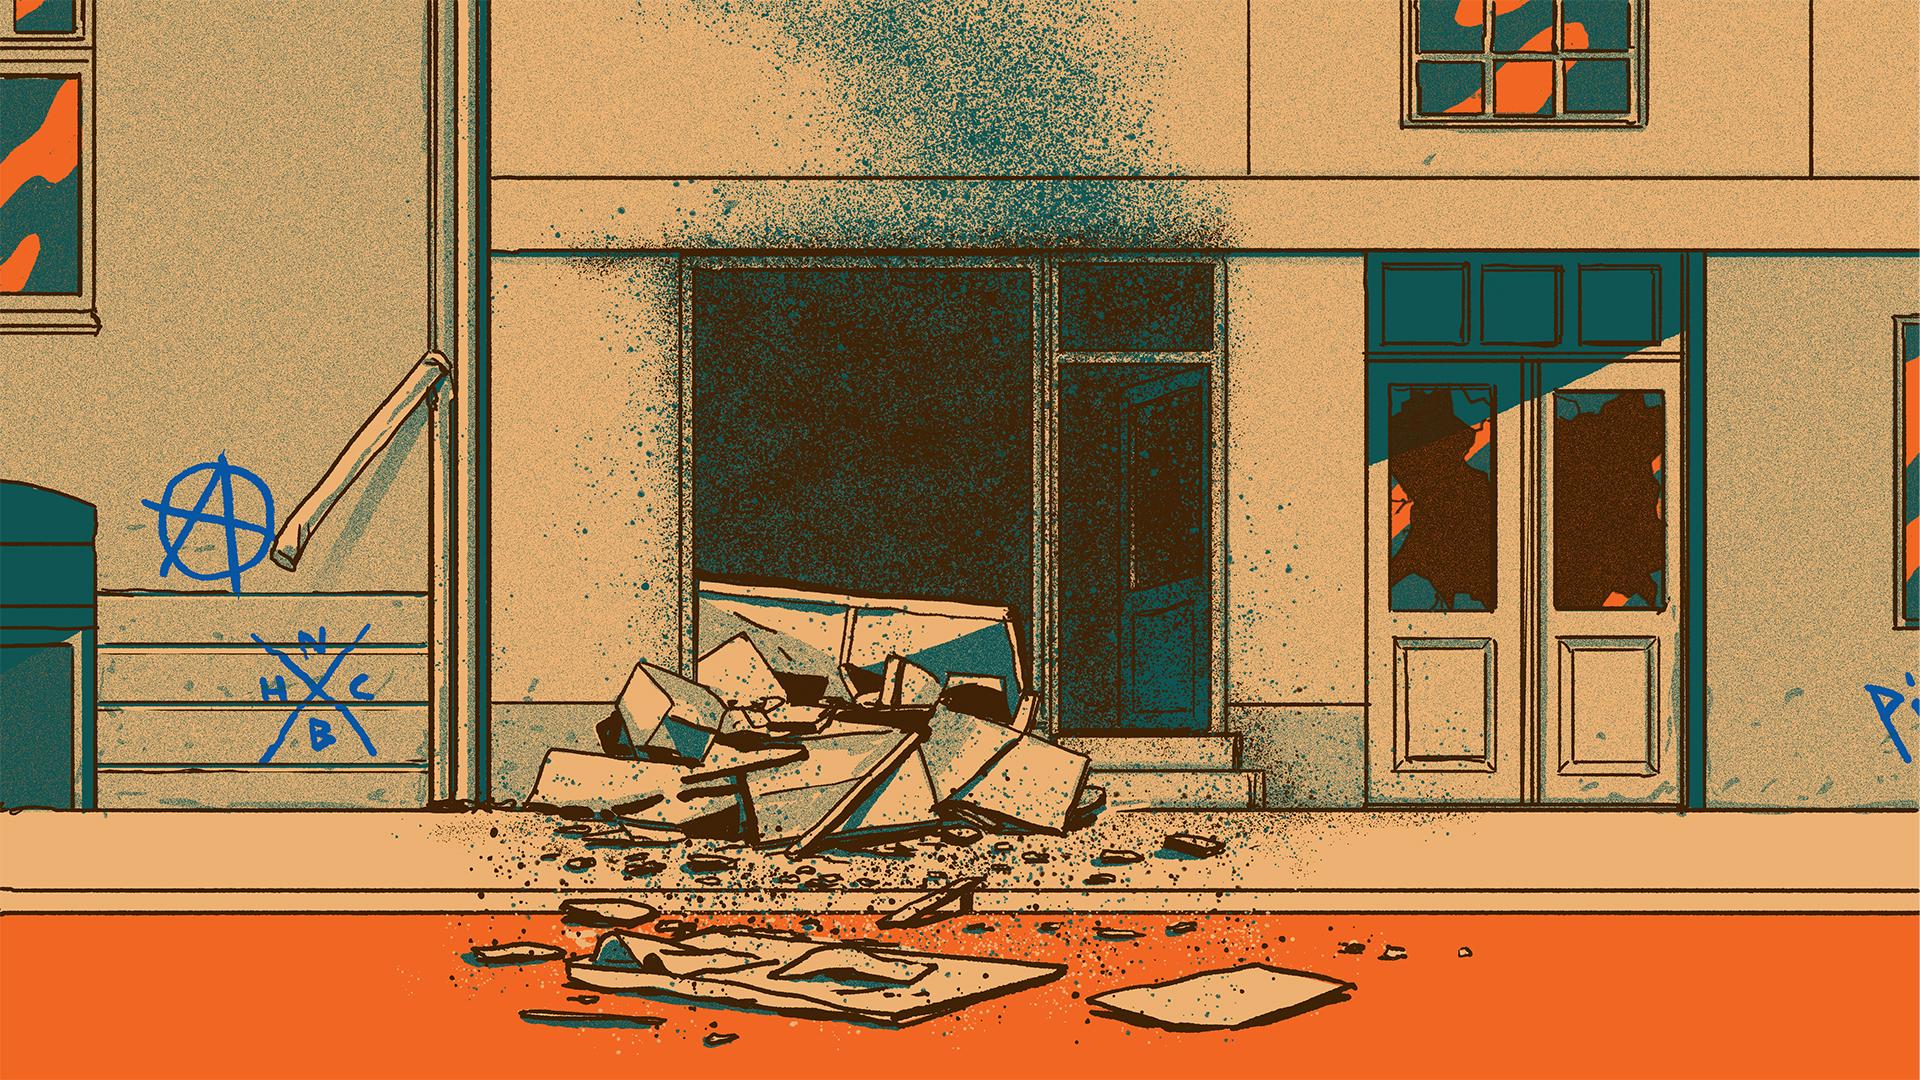 Bomben i Søllerødgade 1:5 - Den brune pakke